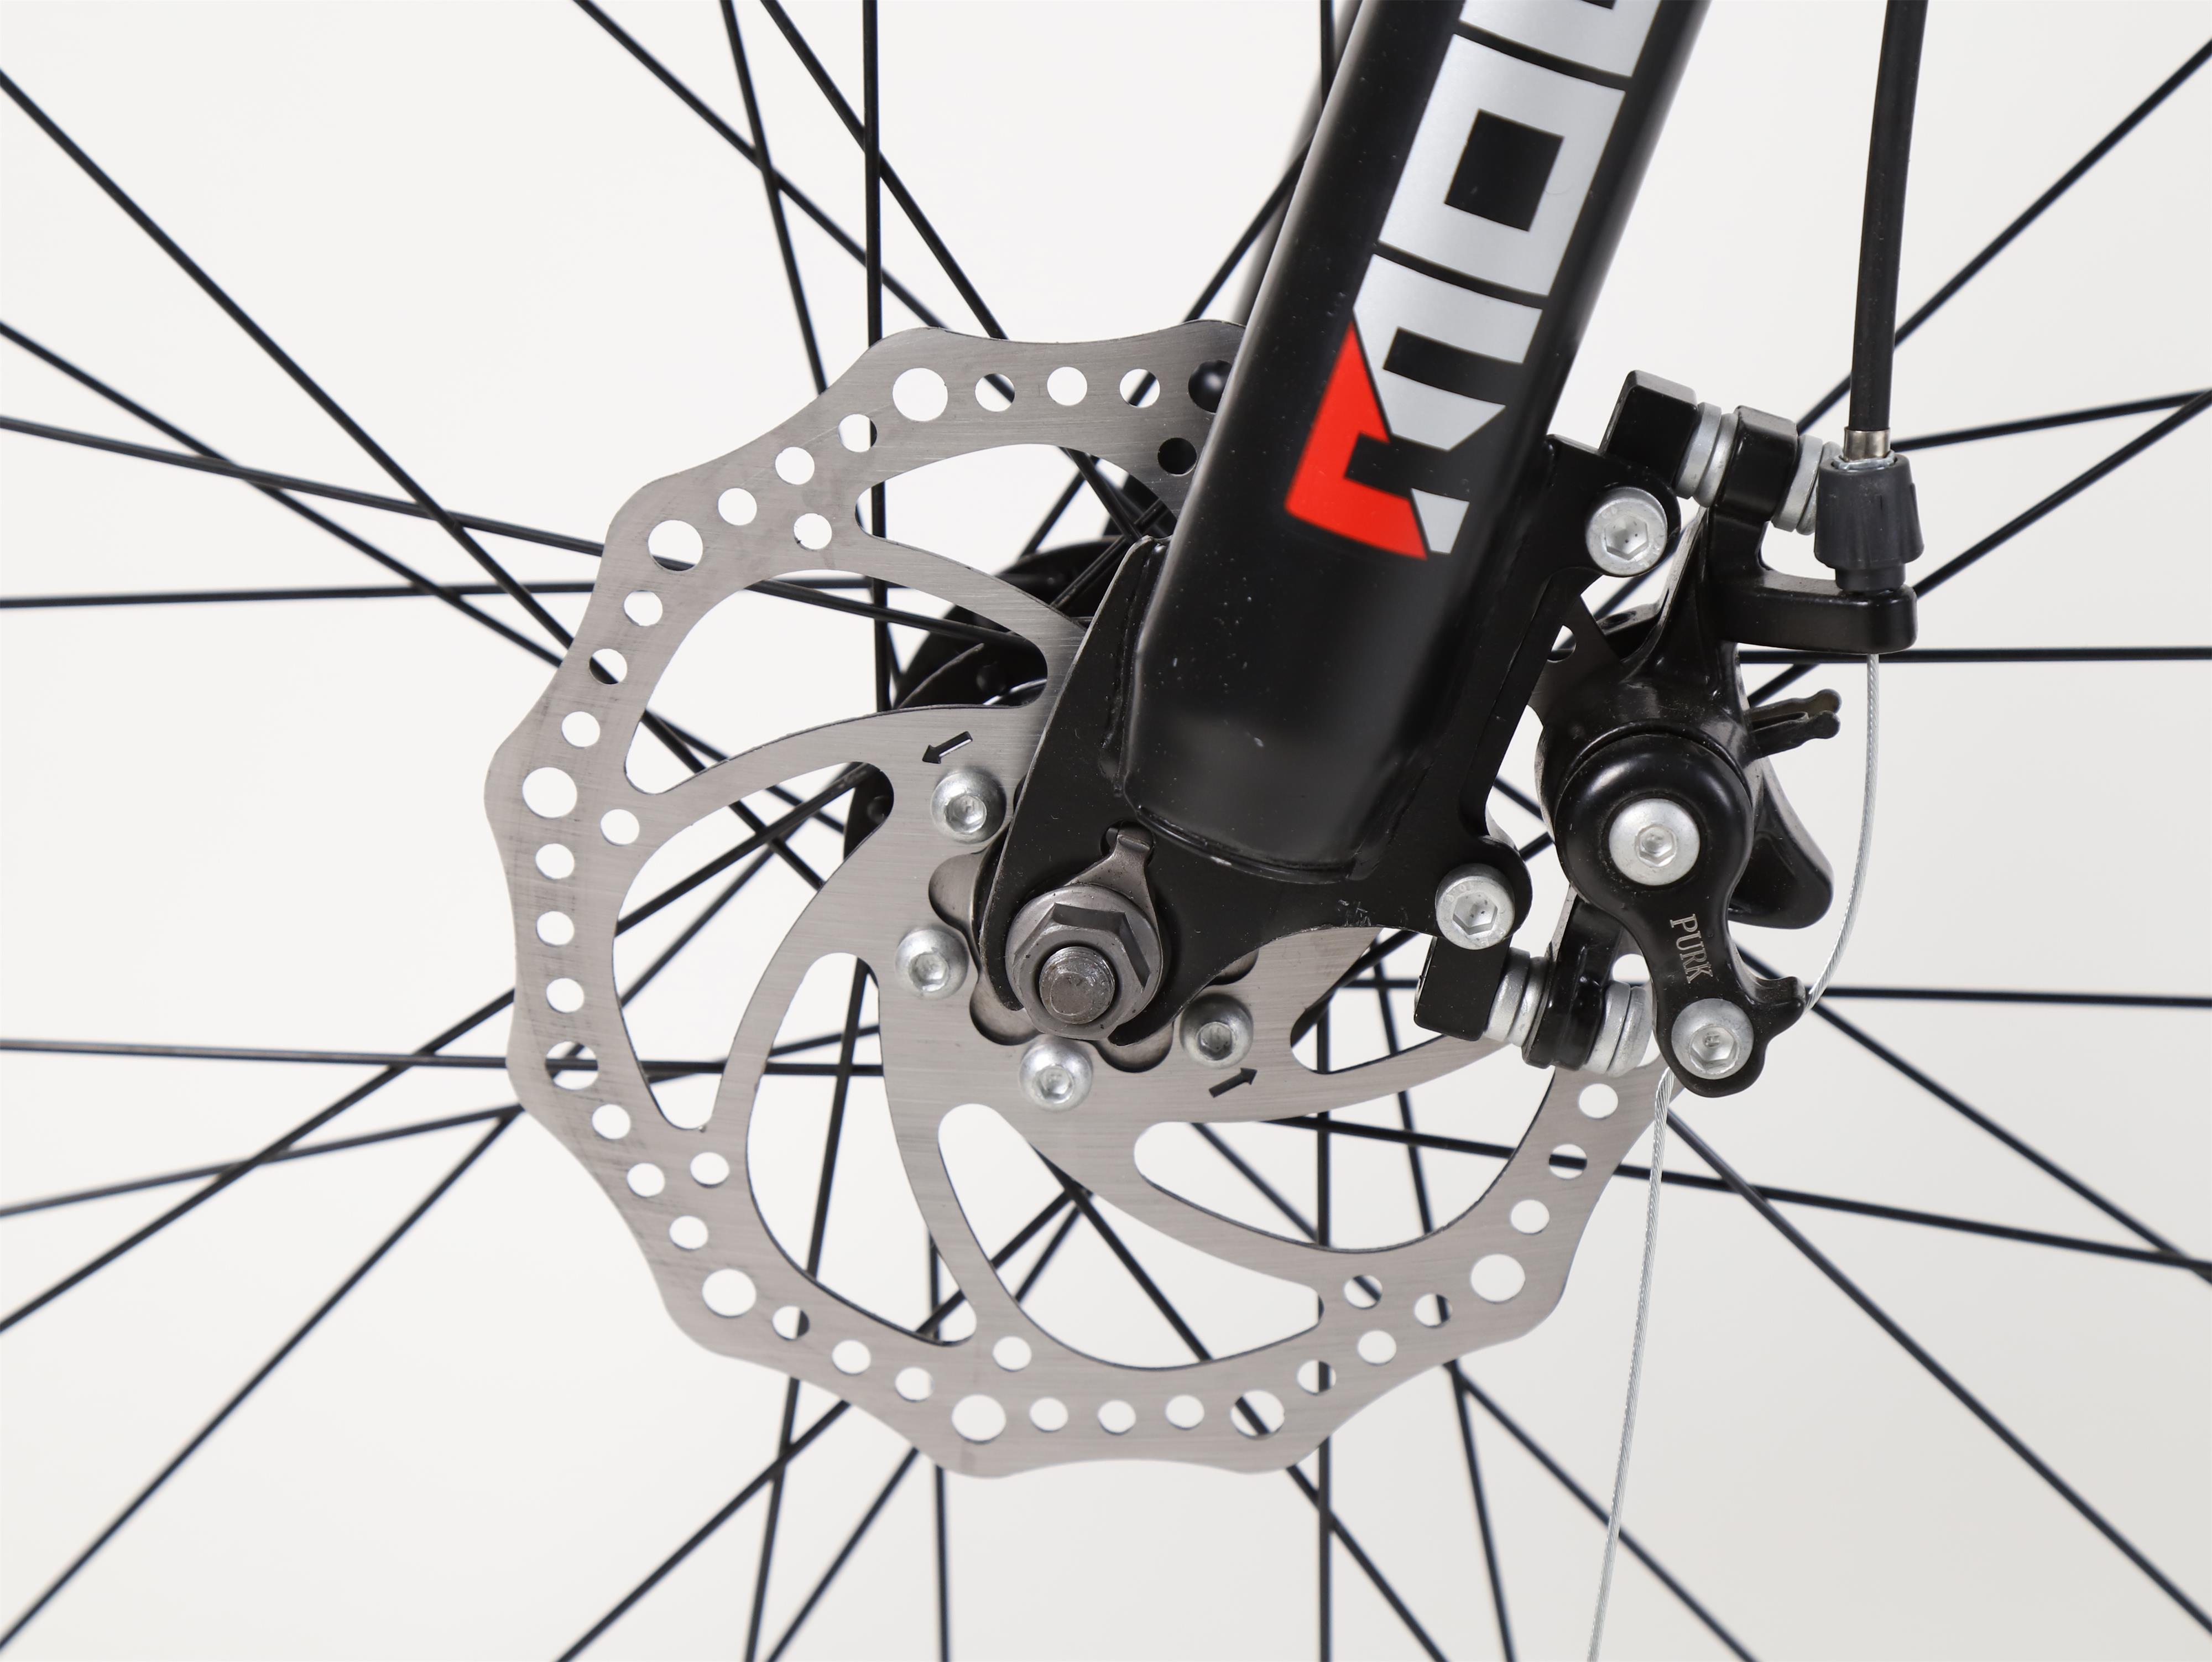 Mondshi27 5 inch mountain bike 24 speed disc brake damping front fork Mondshi27.5-inch mountain bike 24 speed disc brake damping front fork